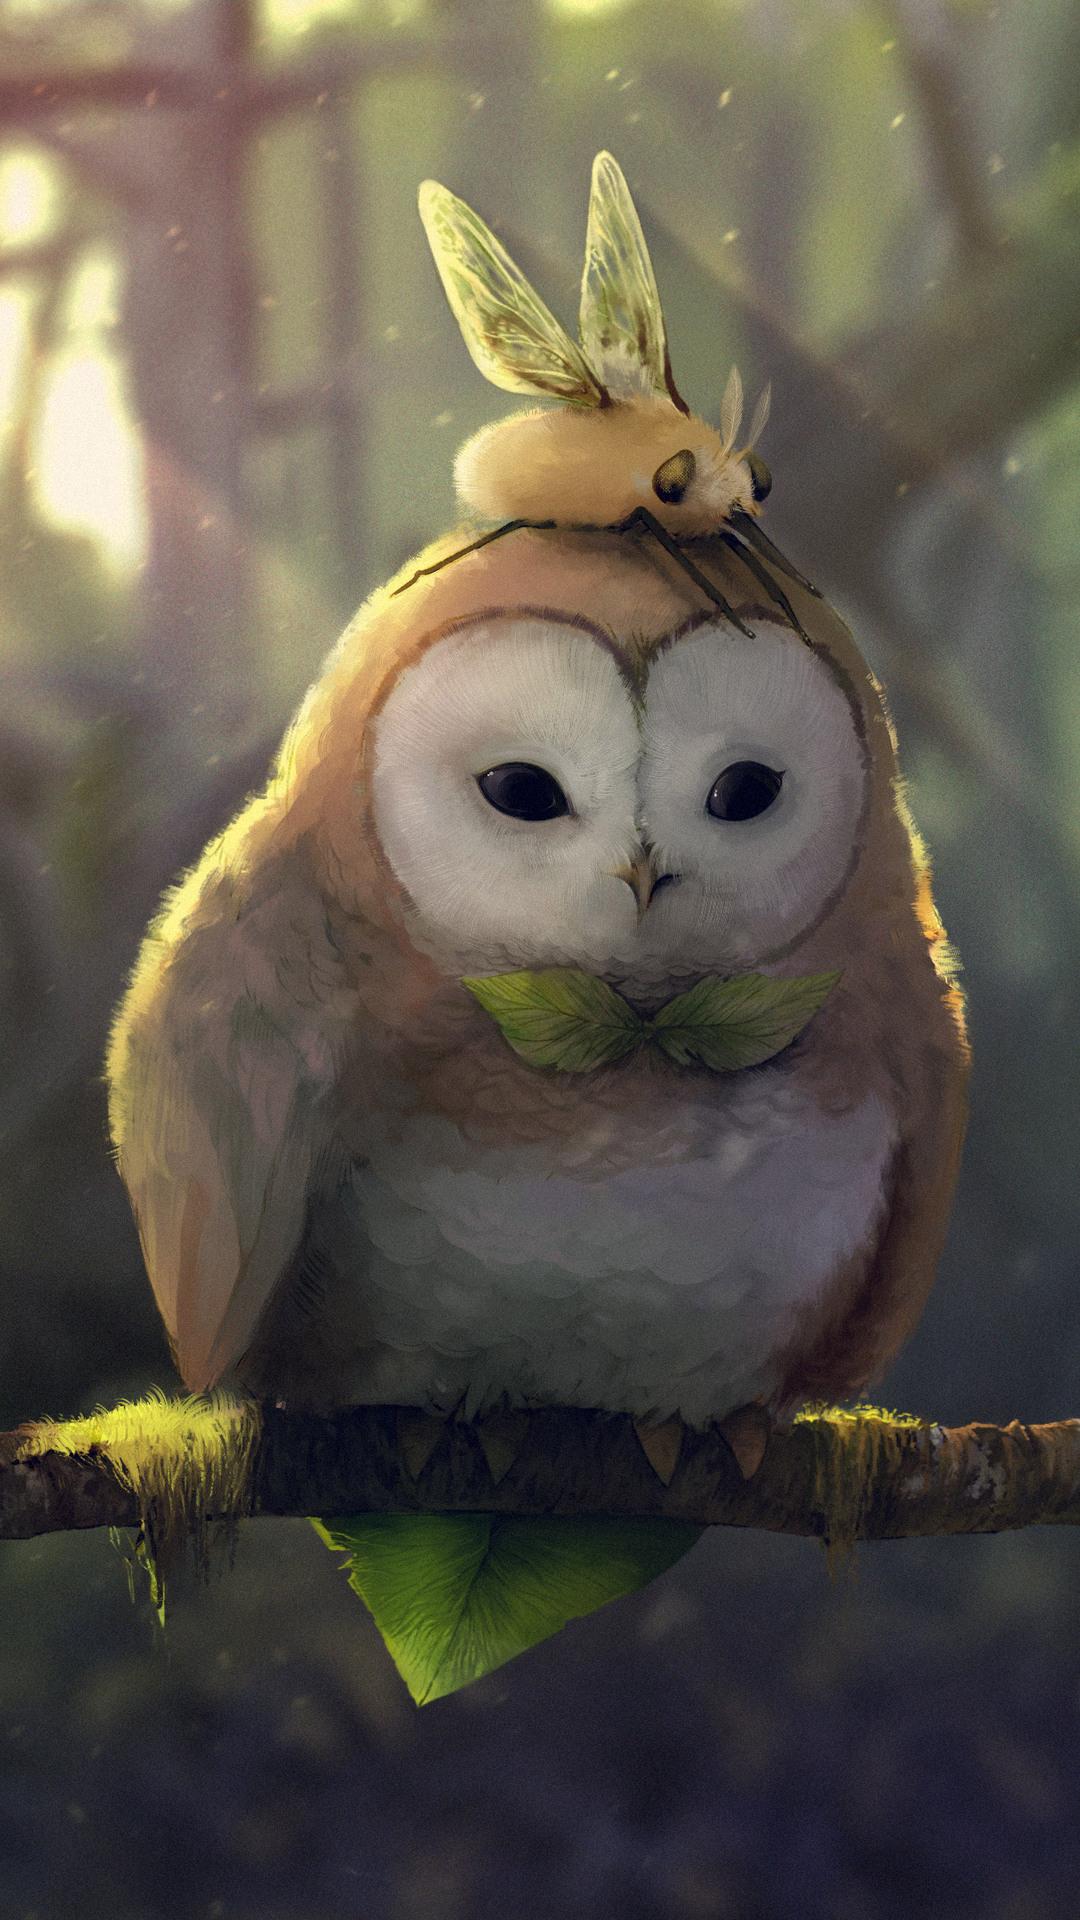 Wallpaper Girls Animados 1080x1920 Tranquil Owl Iphone 7 6s 6 Plus Pixel Xl One